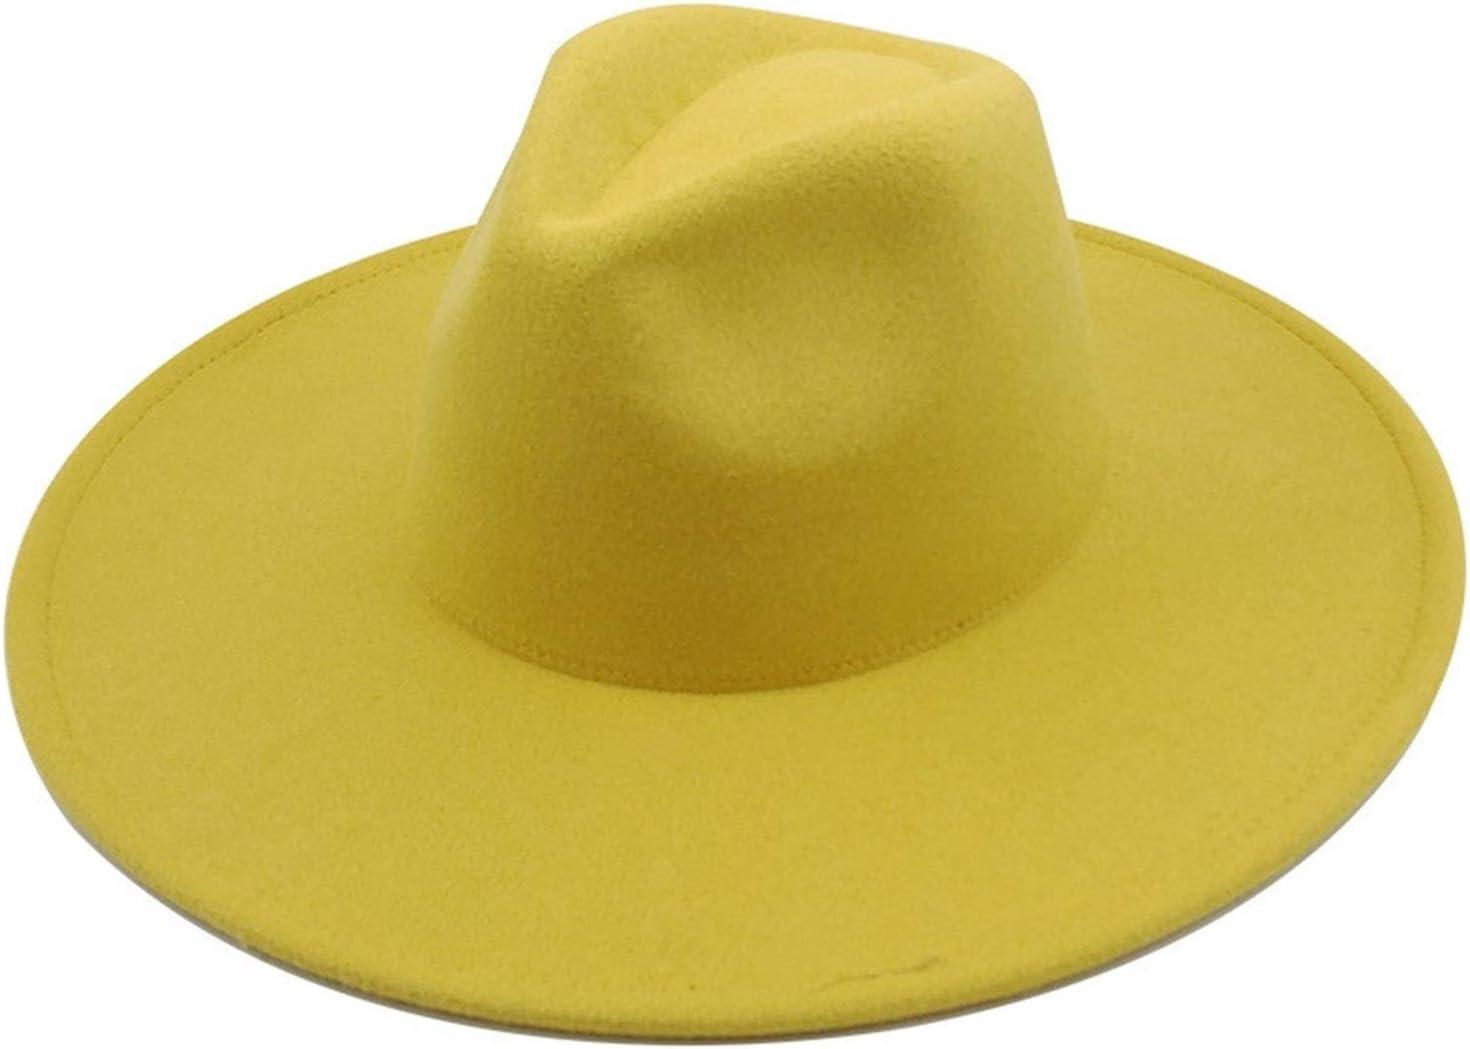 JBIVWW KJACR Classical Wide Brim Fedora Hat Black White Hats Men Women Crushable Winter Hat Derby Wedding Church Jazz Hats (Color : 12, Size : 56 58cm)